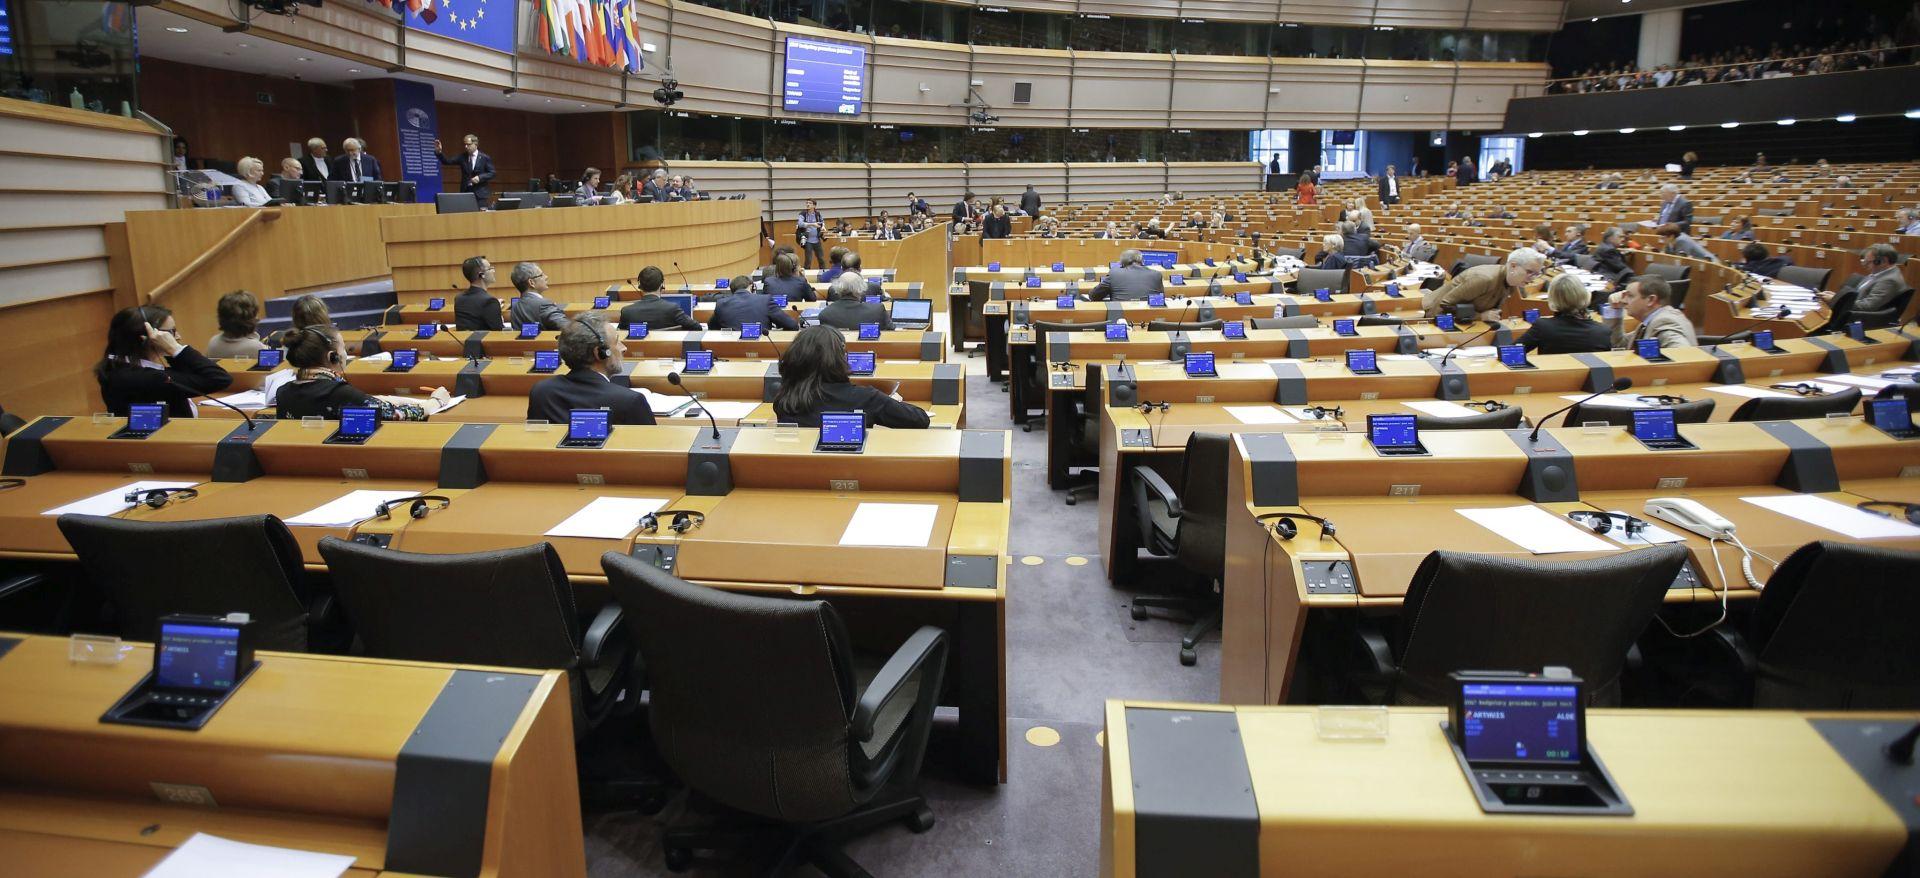 Pittella i McGuinness kandidati za predsjednika Europskog parlamenta